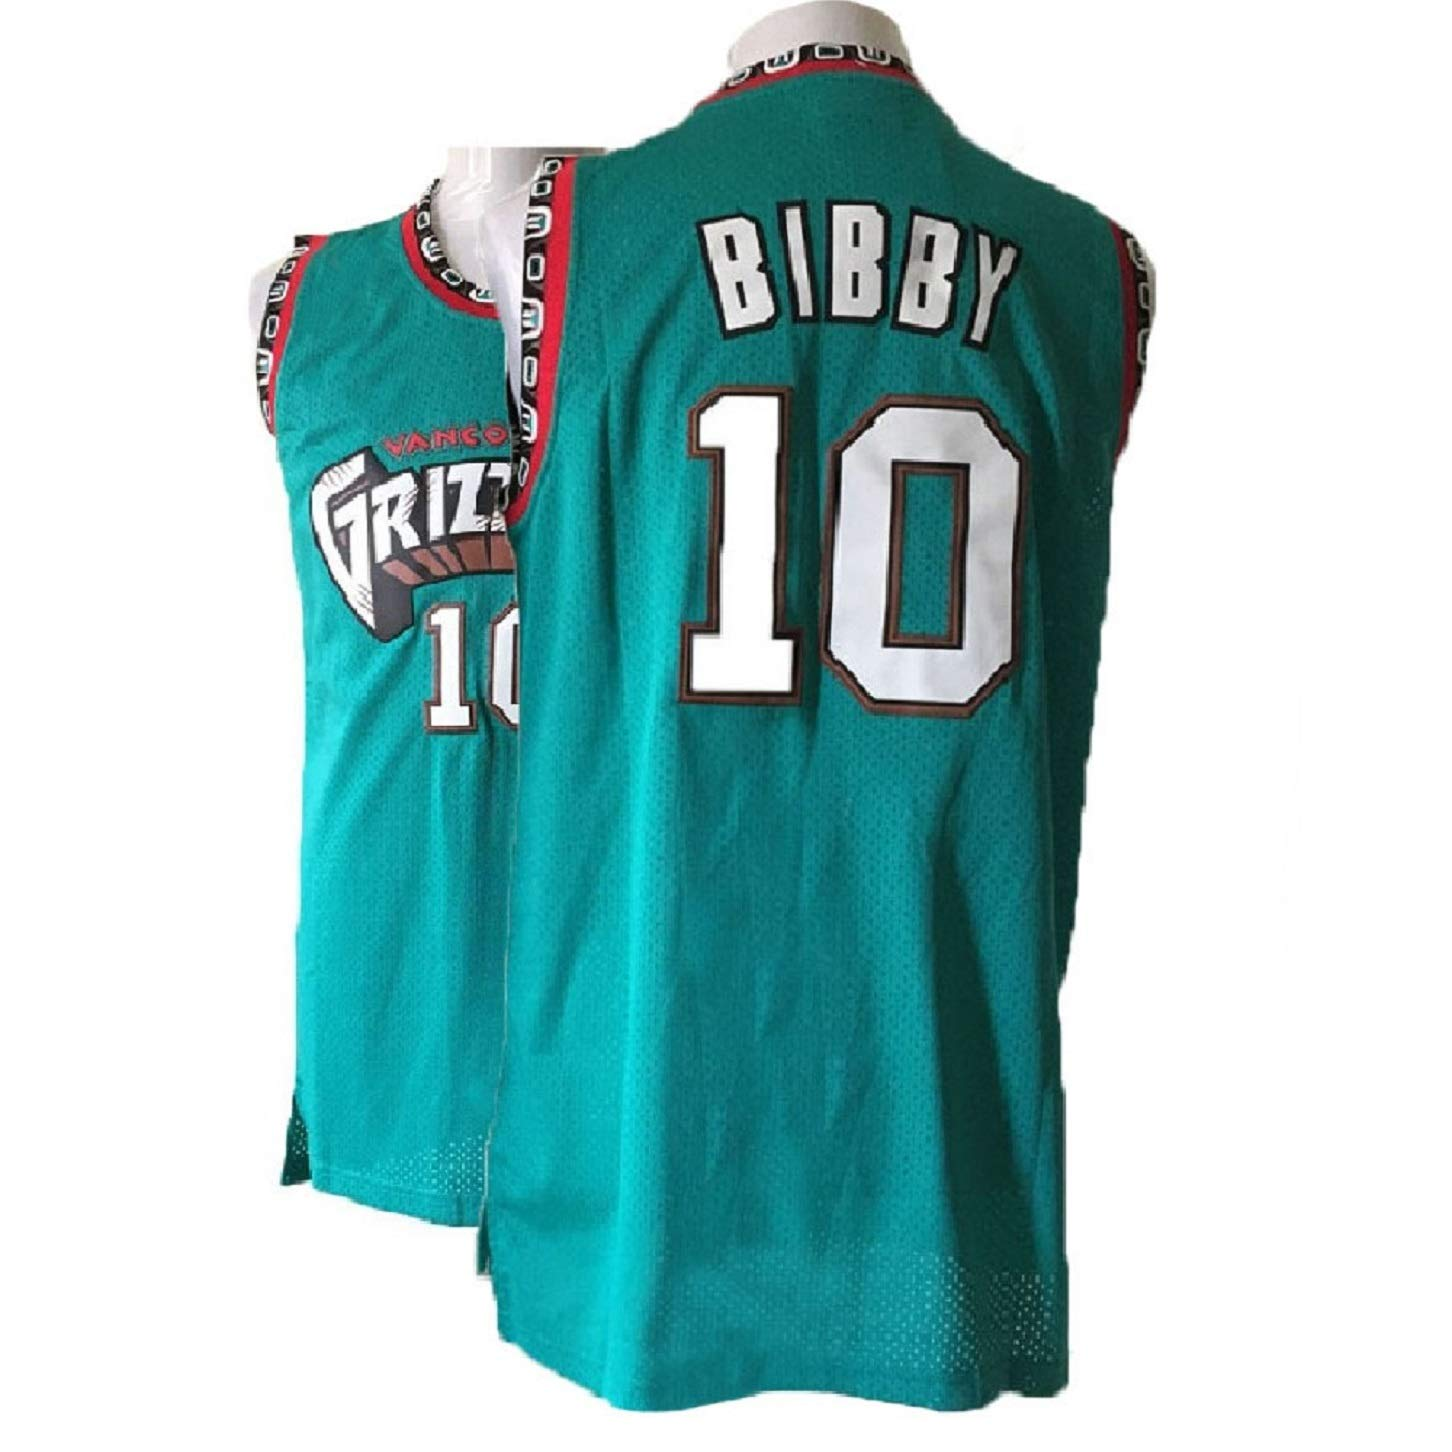 Haeyev Mens Bibby Retro Jerseys Green Athletics Jersey Basketball #10 Jersey